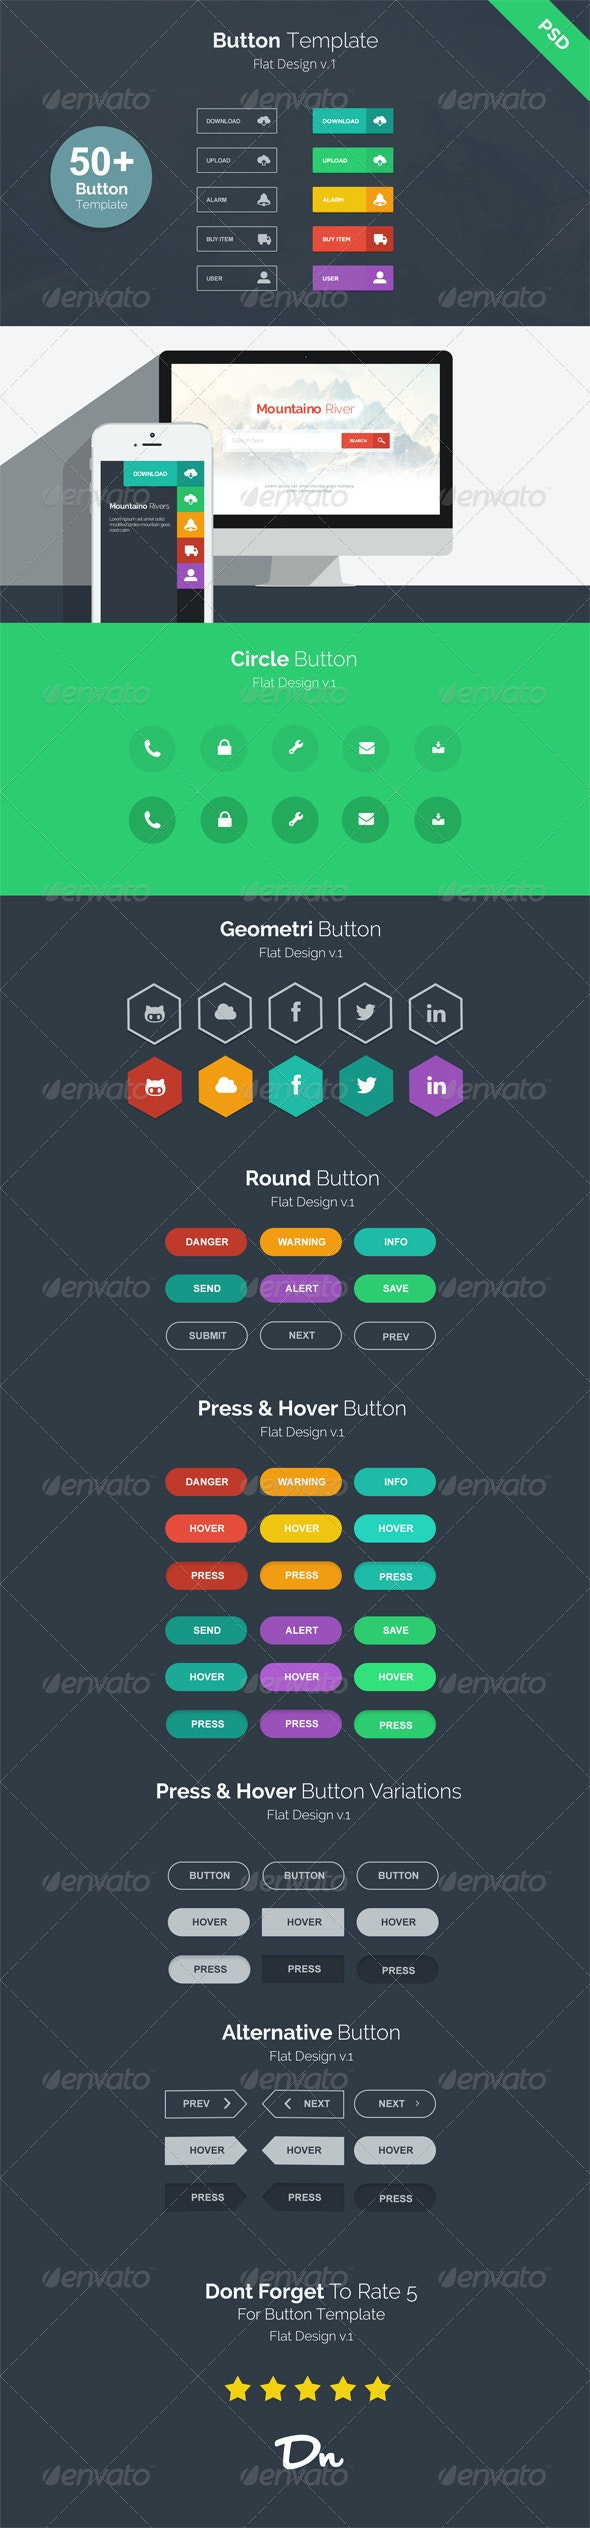 Button Template v.1 - Buttons Web Elements